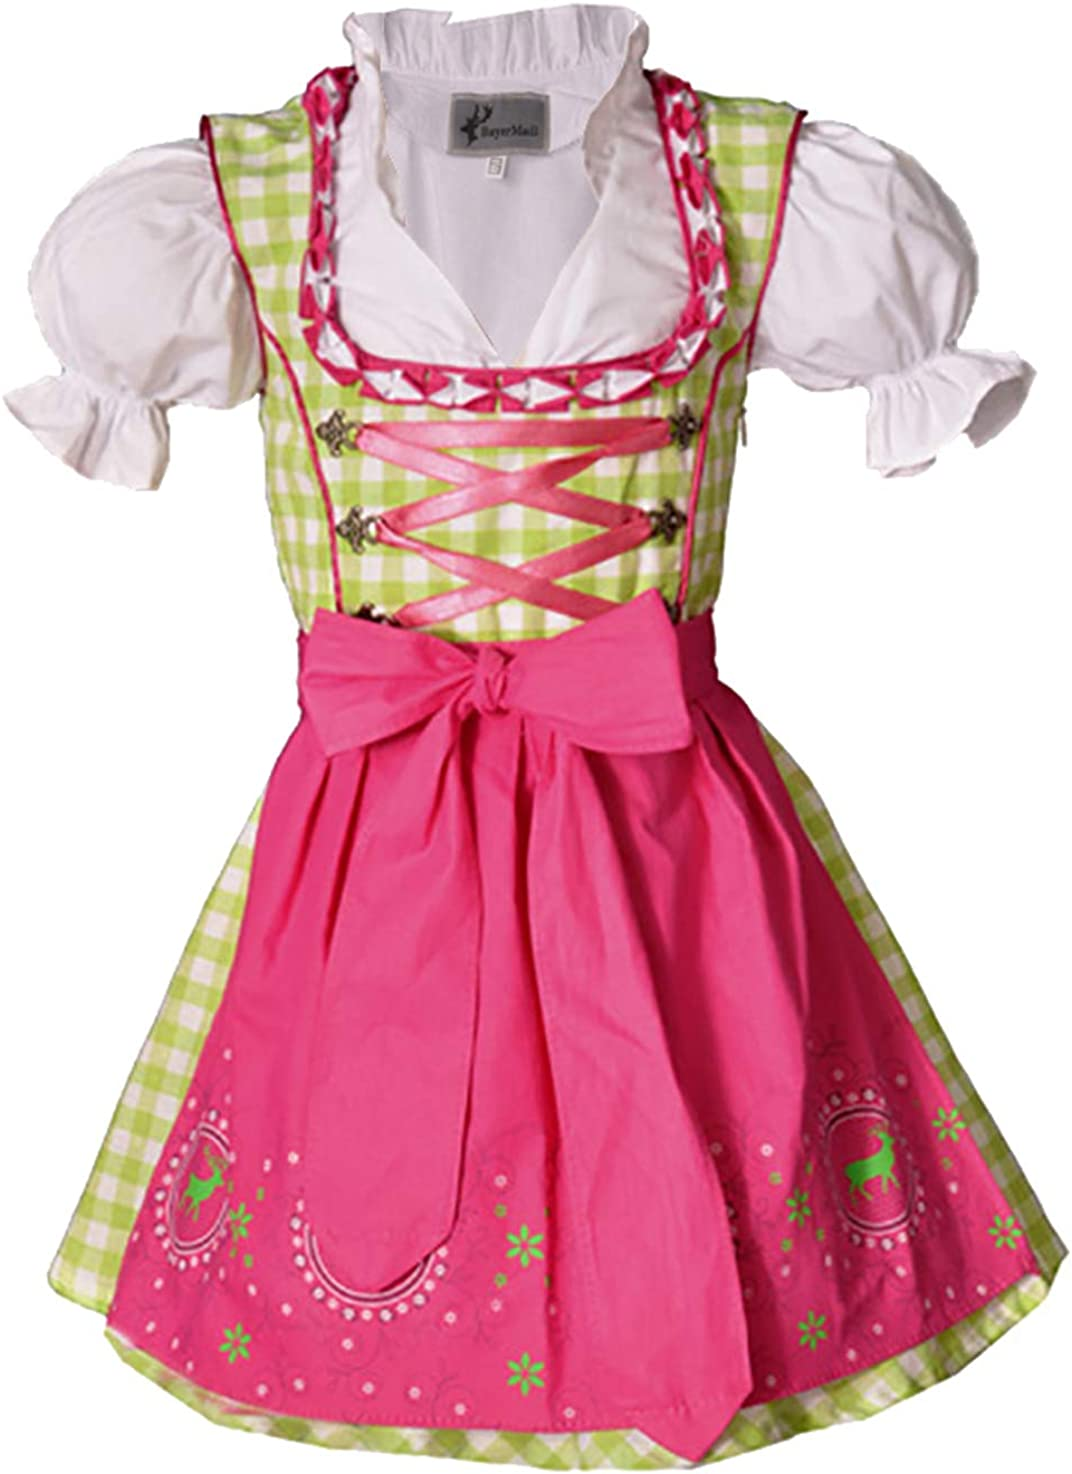 Trachtenset 3-TLG Sch/ürze und Bluse Gr/ö/ßen 92-152 Bayer Madl Kinderdirndl Carolin gr/ün//pink Dirndl inkl